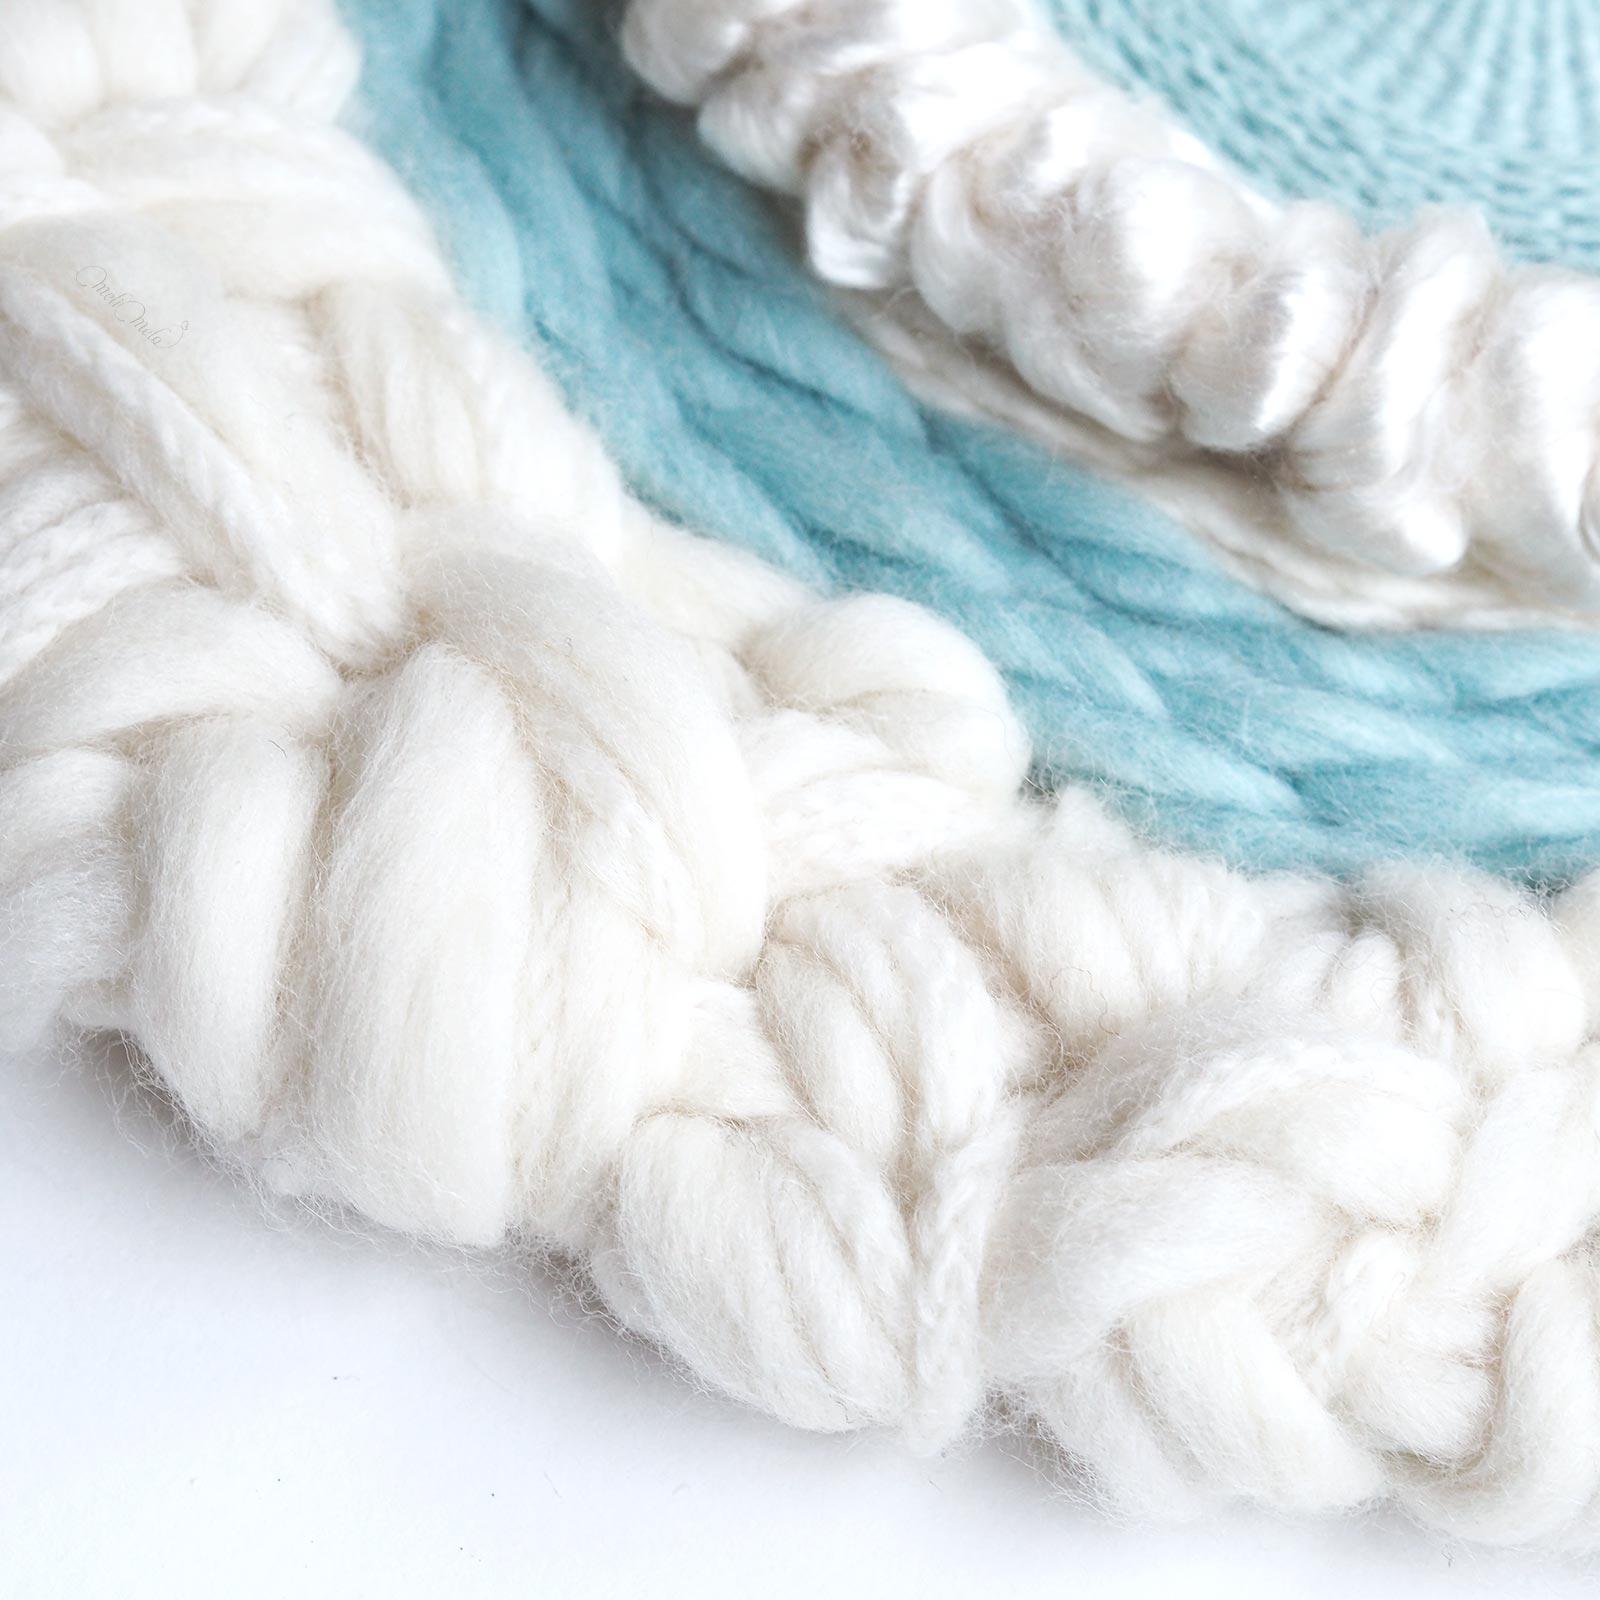 Round weaving tissage circulaire Lune soie enlainée Funem Studio wool woolandthegang weareknitters string harvest laboutiquedemelimelo